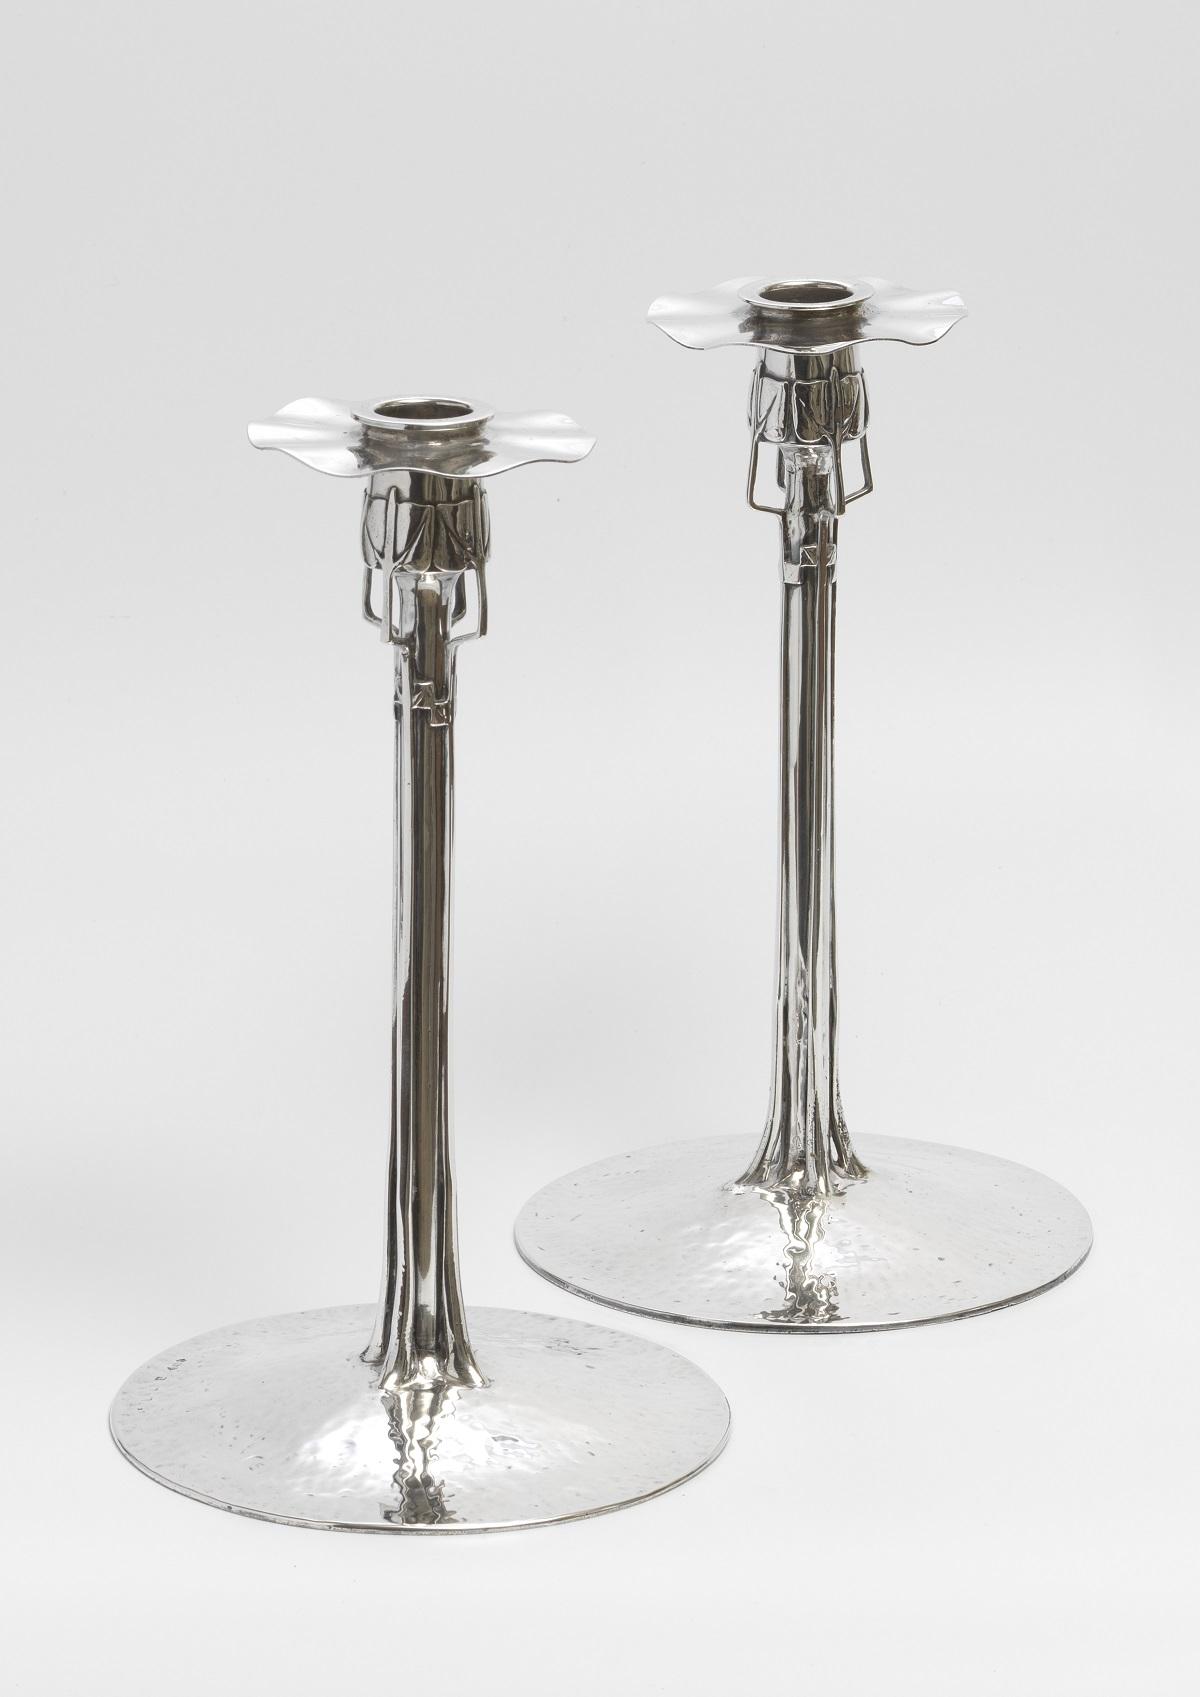 Liberty Cymric Conister candlesticks